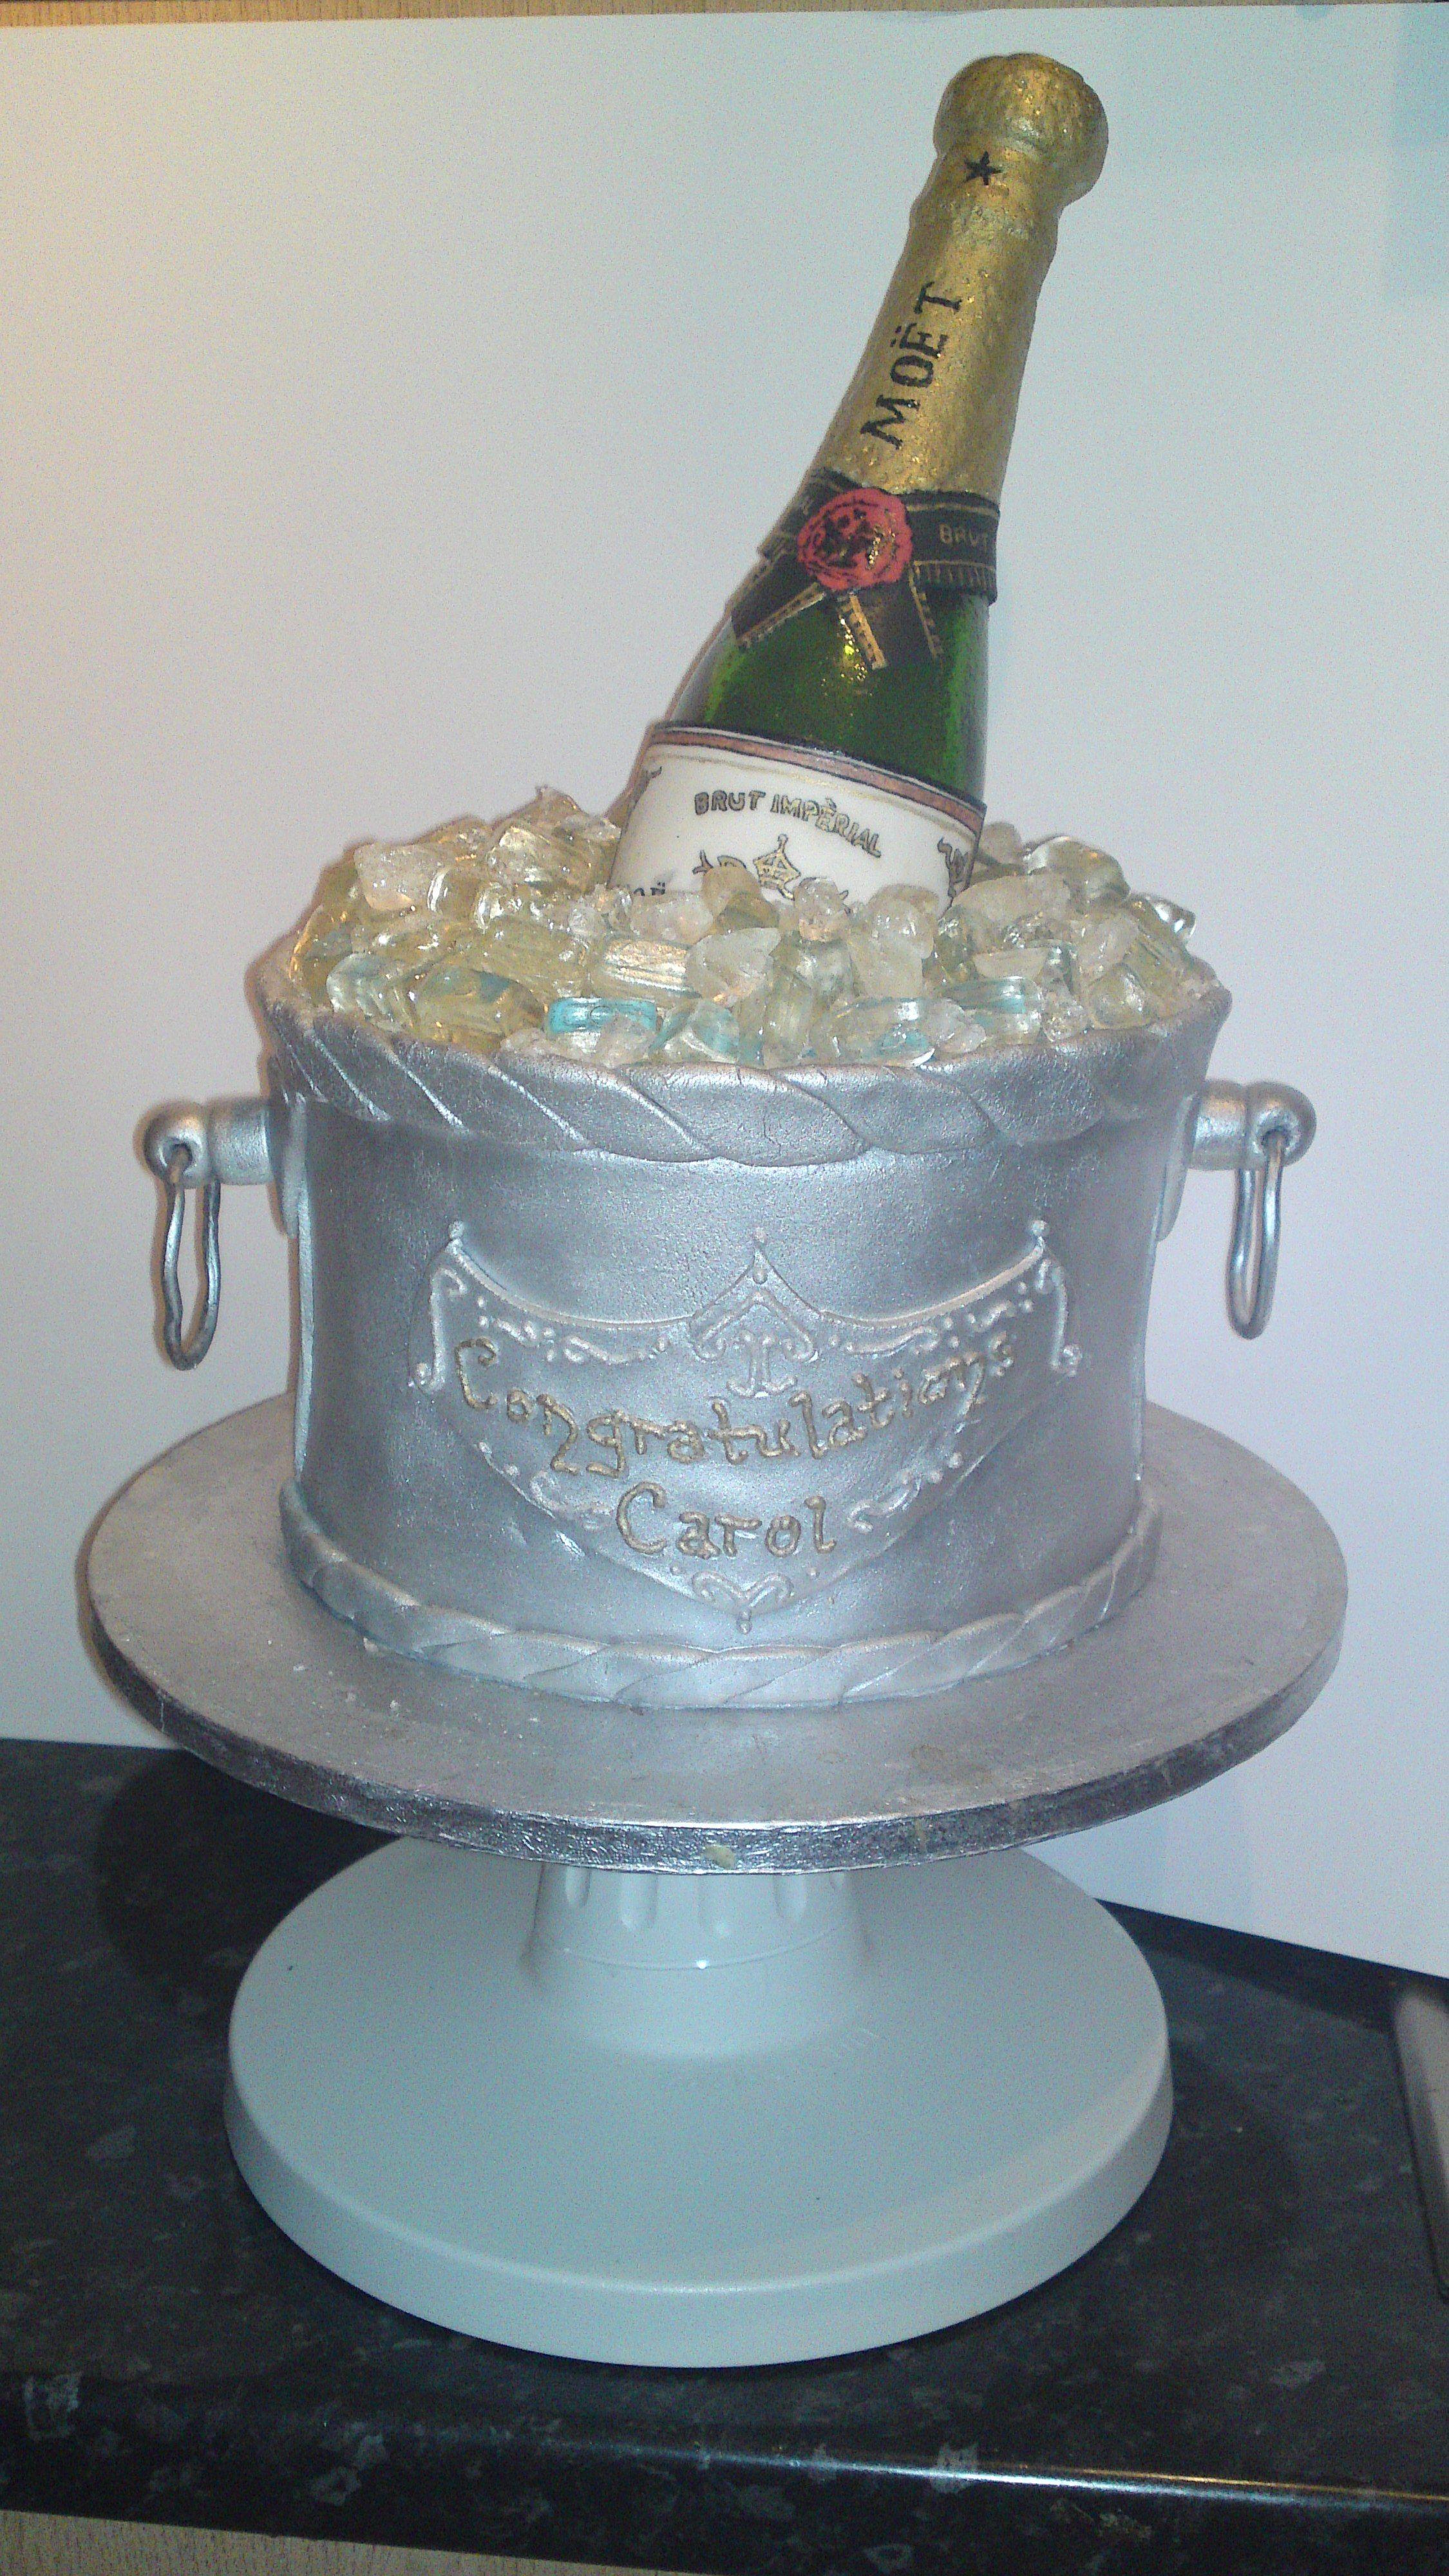 Champagne Bottle Cake - Sugar bottle, painted label, cake bucket